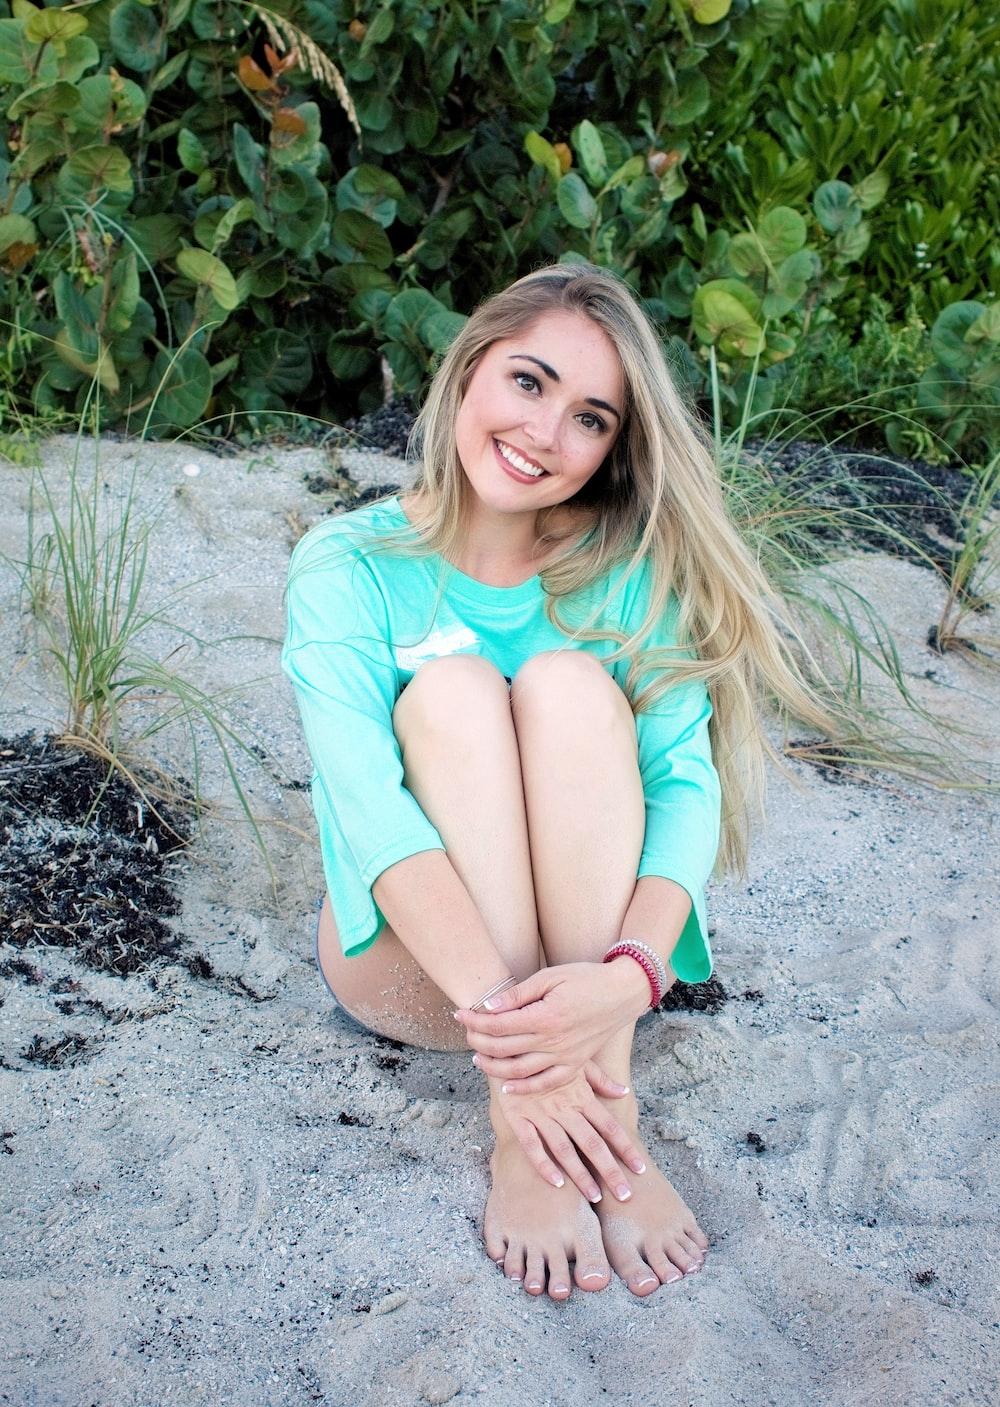 smiling girl sitting on sand during daytime